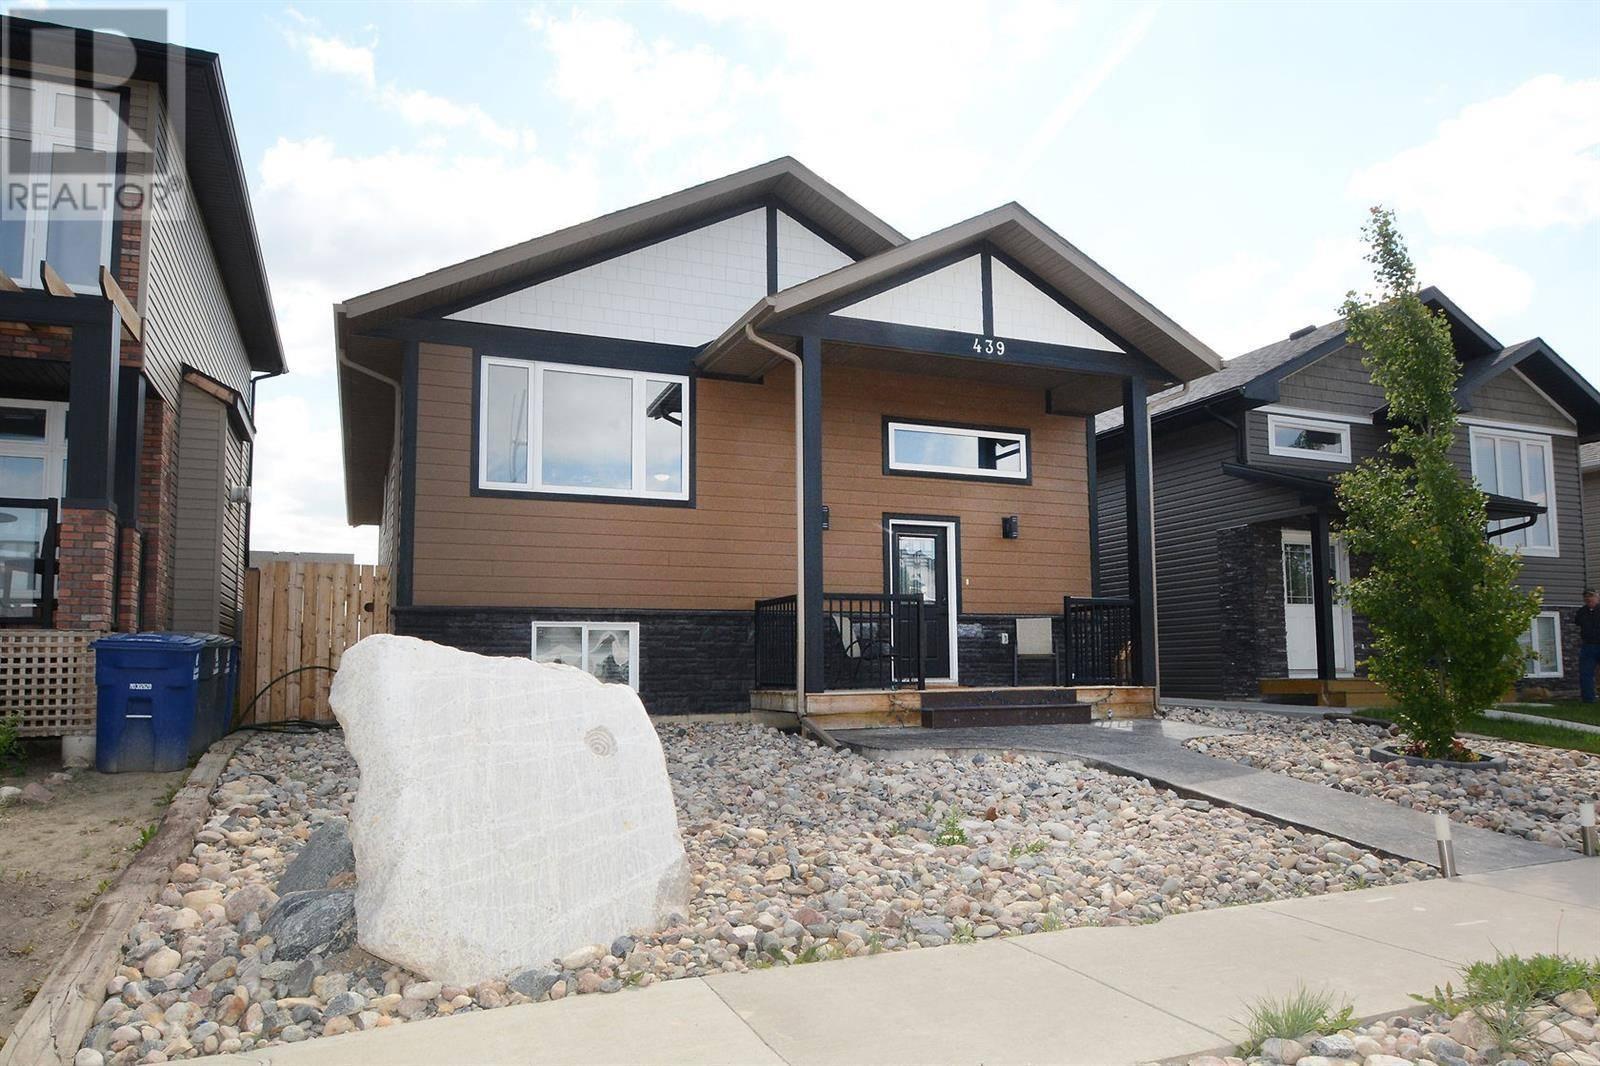 House for sale at 439 Evergreen Blvd Saskatoon Saskatchewan - MLS: SK792410